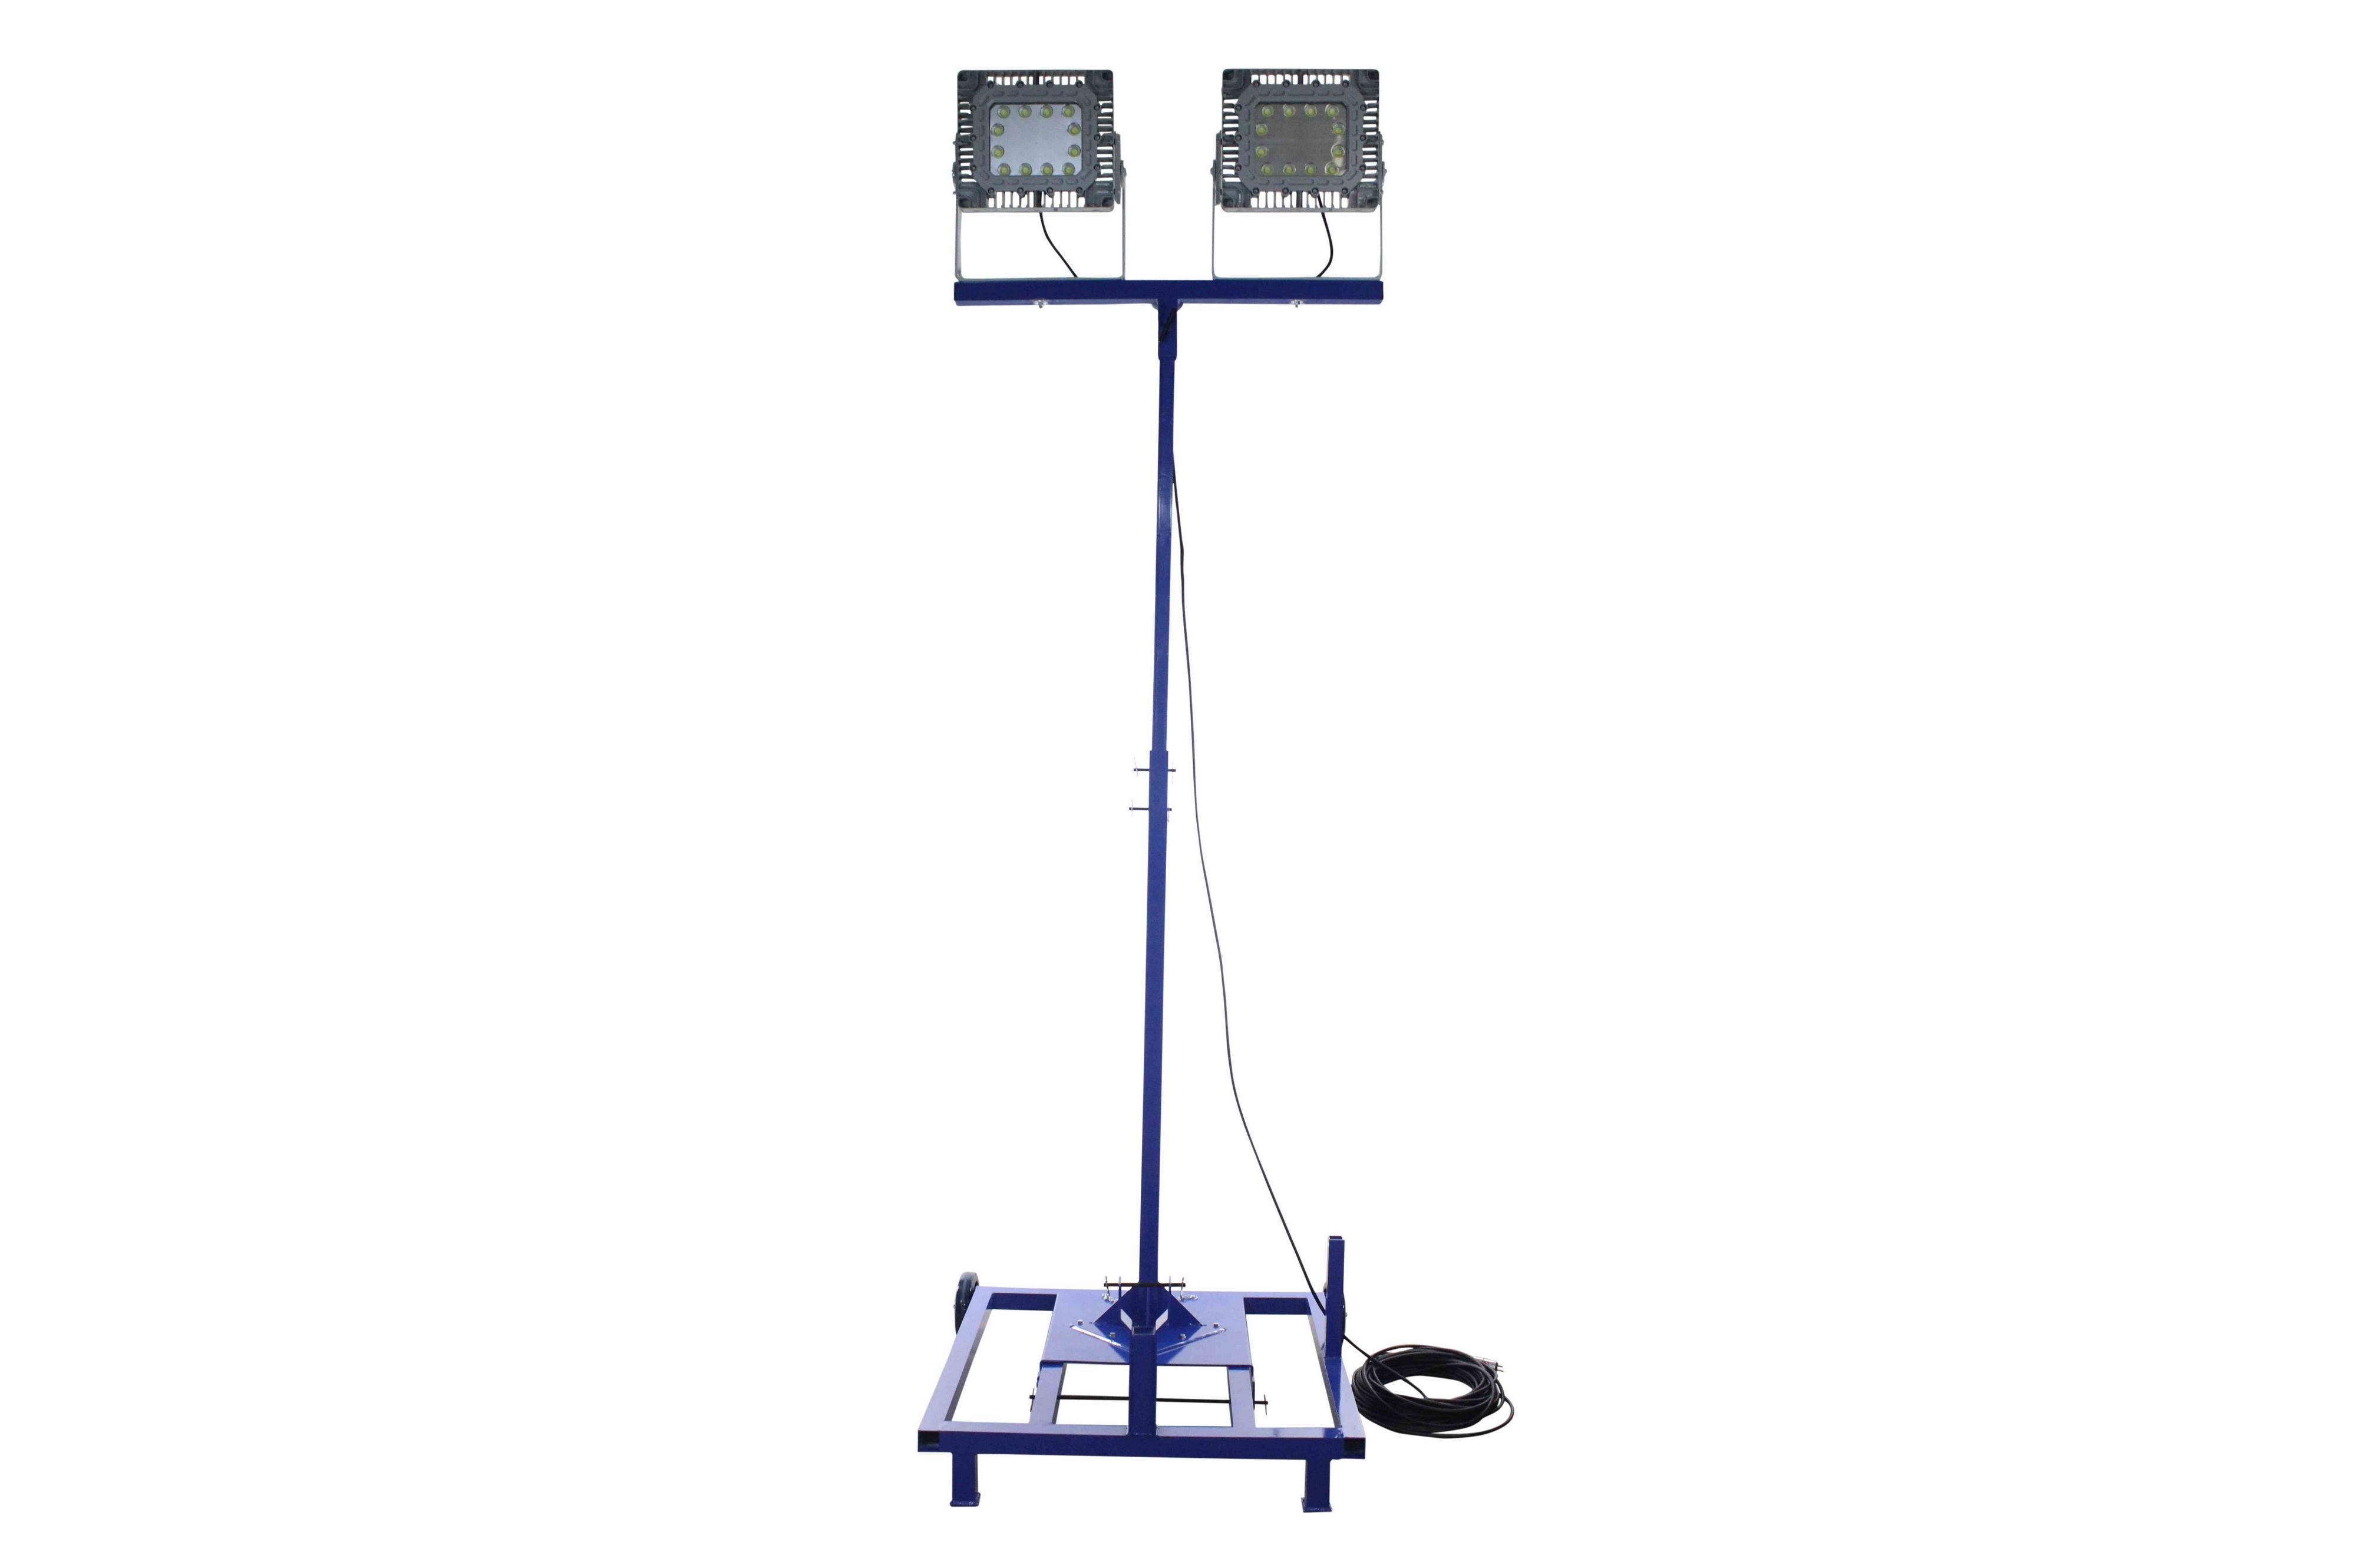 300 Watt Hazardous Location Extendible Led Light Tower W